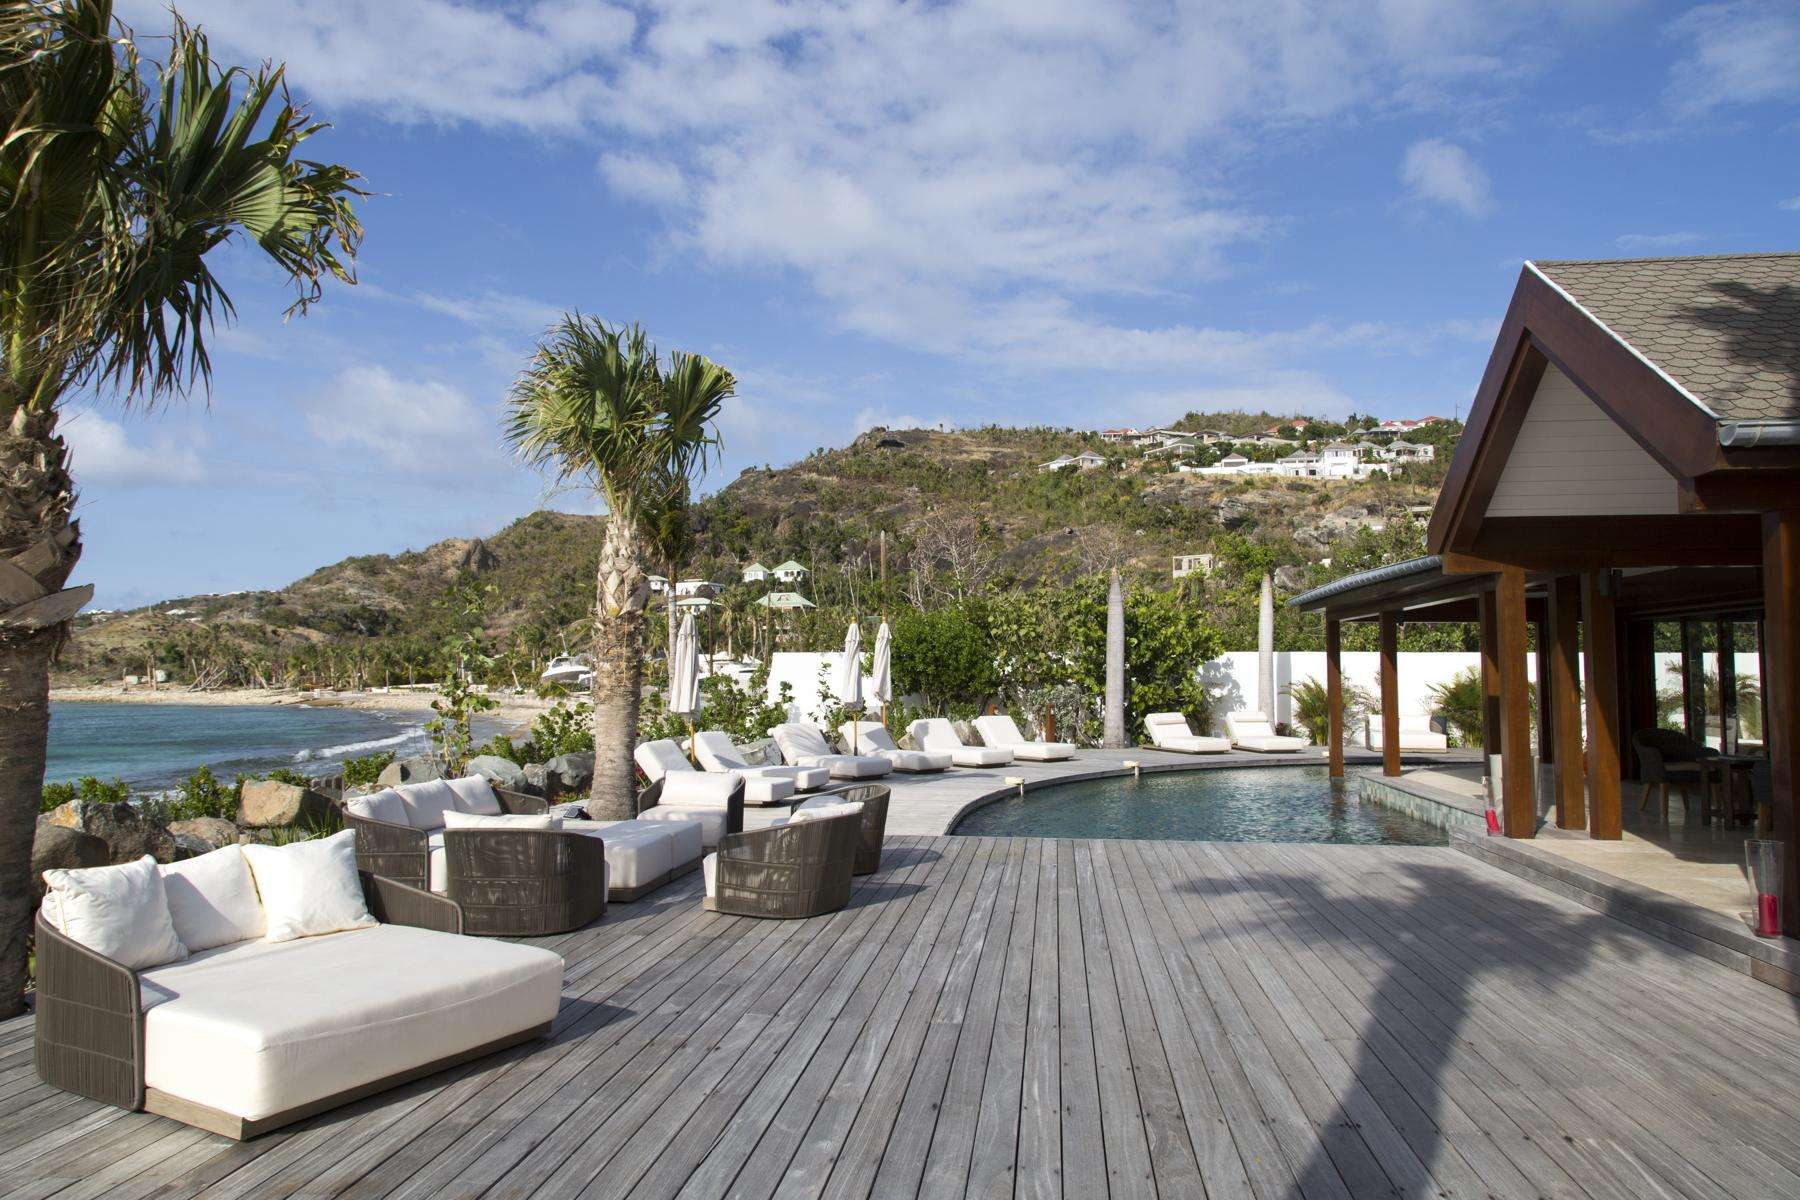 Luxury villa rentals caribbean - St barthelemy - Lorient - la Plage - Image 1/32